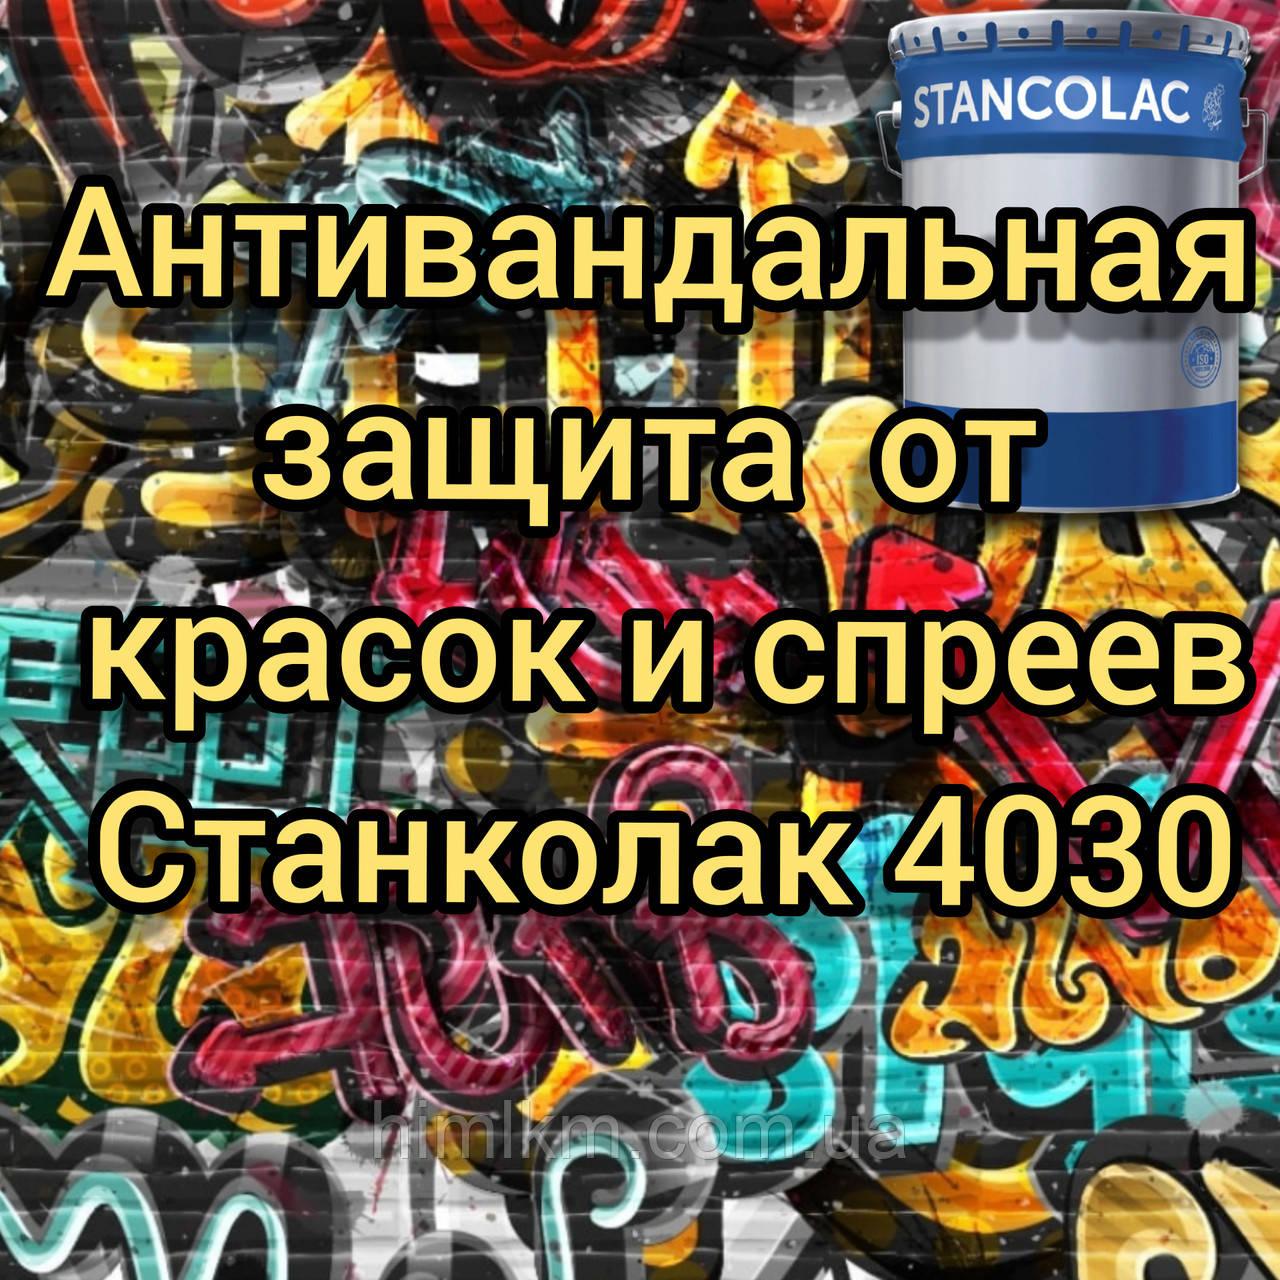 Краска защитная антивандальная 4030 Antigraffiti антиграффити Станколак, 10 литров